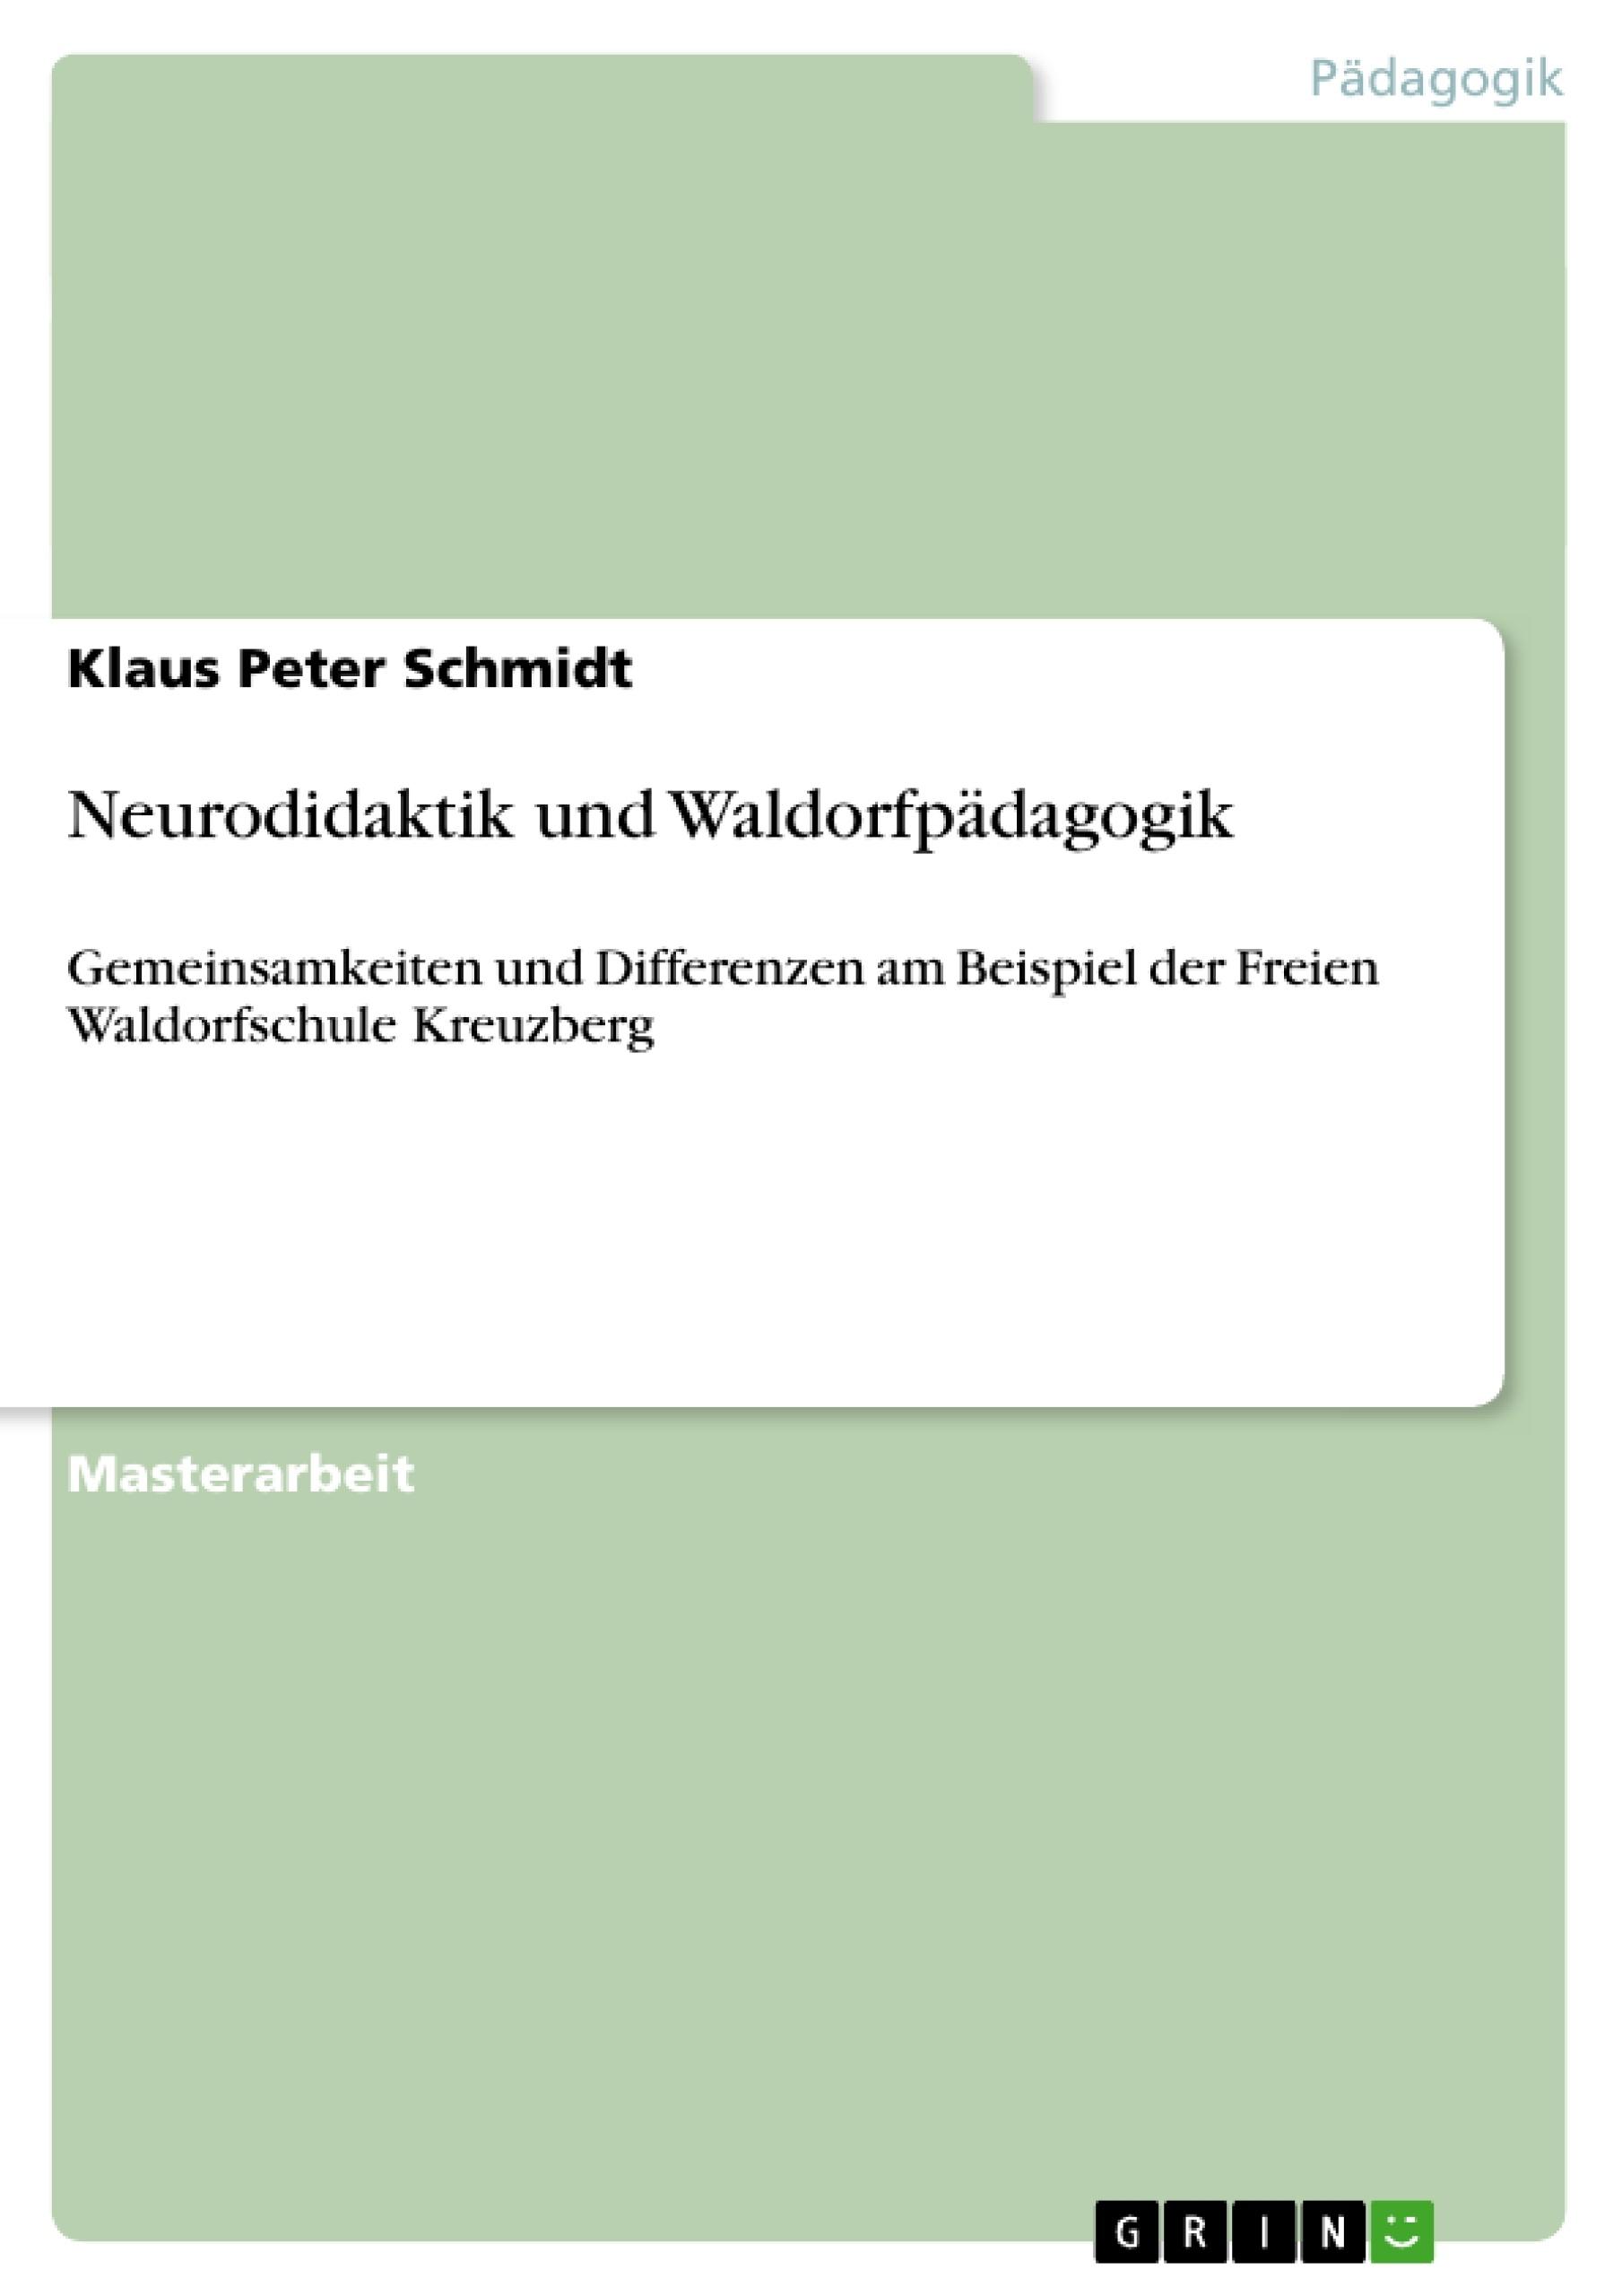 Titel: Neurodidaktik und Waldorfpädagogik